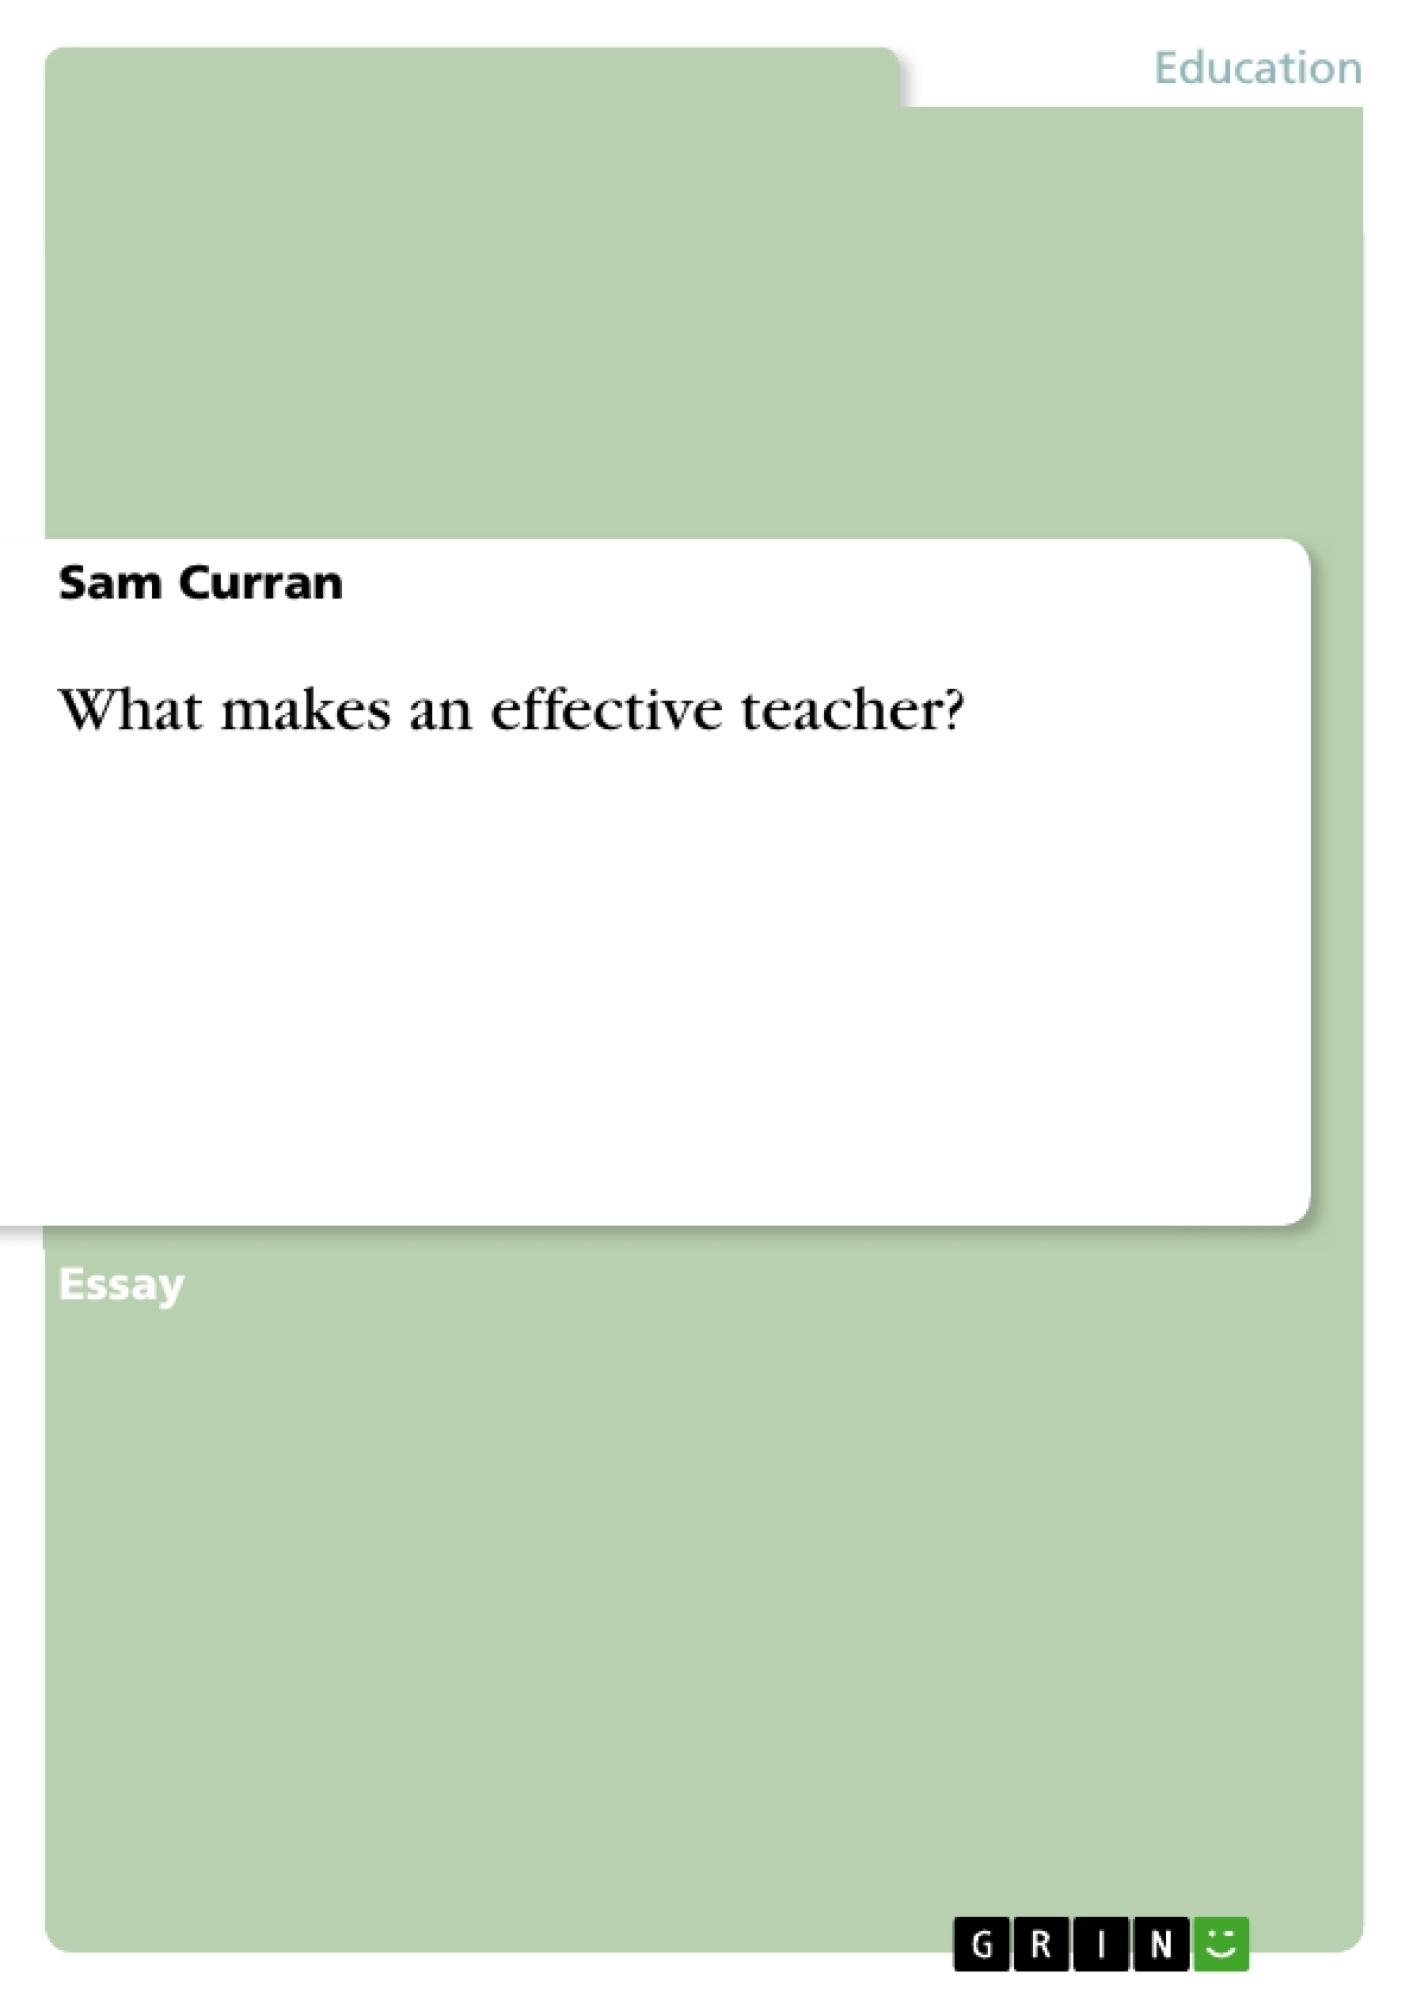 Title: What makes an effective teacher?